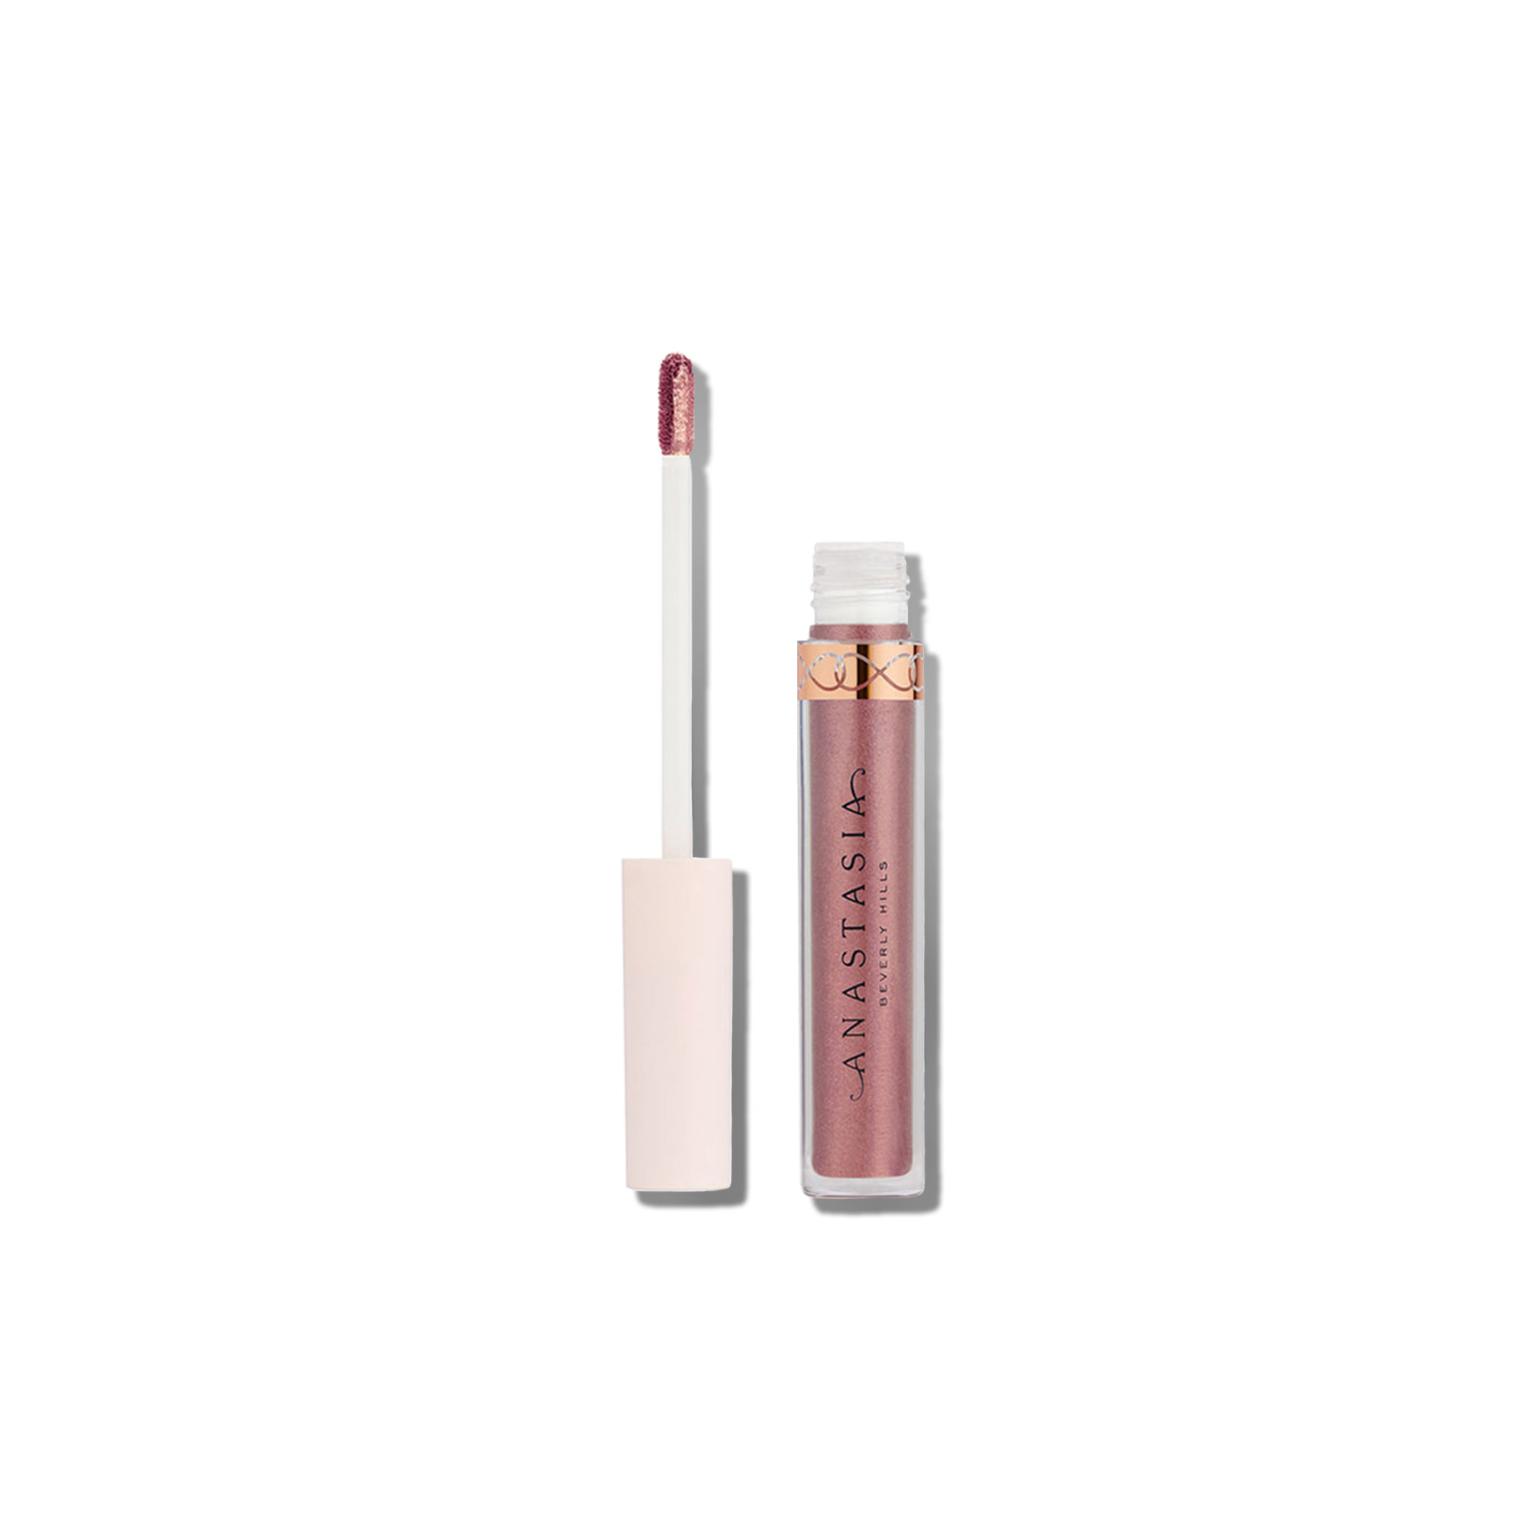 Anastasia Beverly Hills Potion Liquid Lipstick Dupes - All